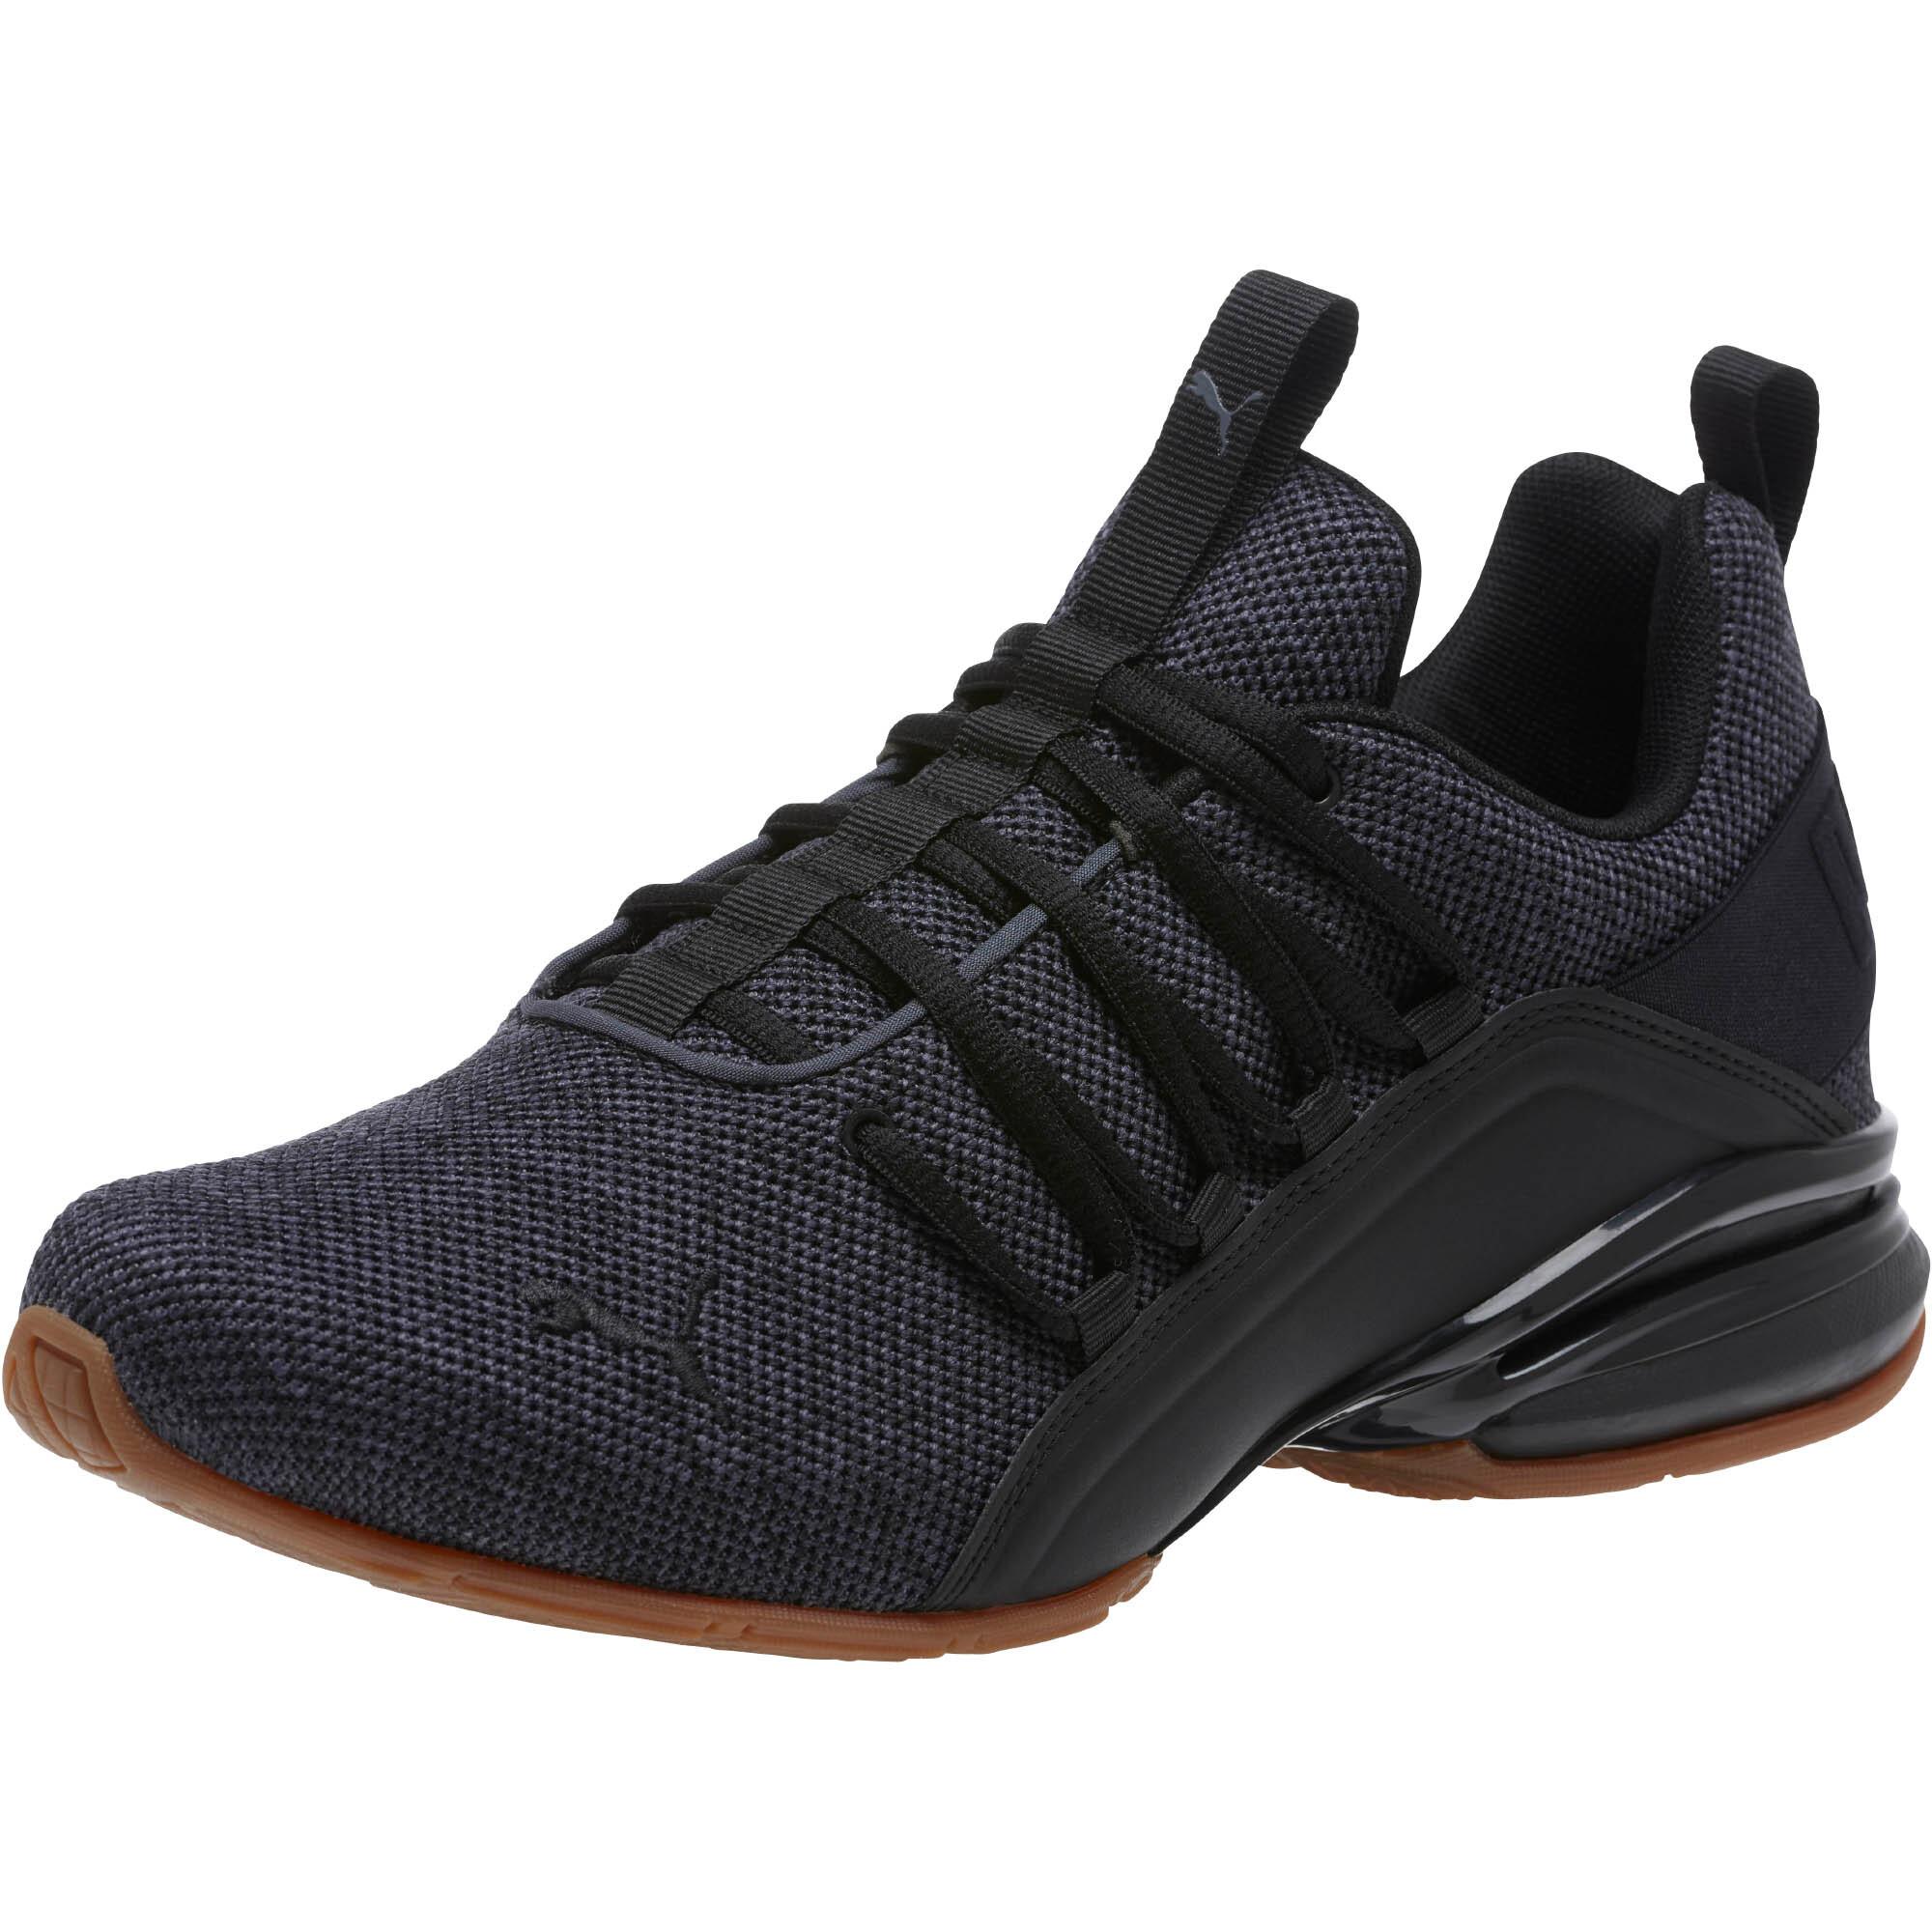 PUMA-Axelion-Men-039-s-Training-Shoes-Men-Shoe-Running thumbnail 22